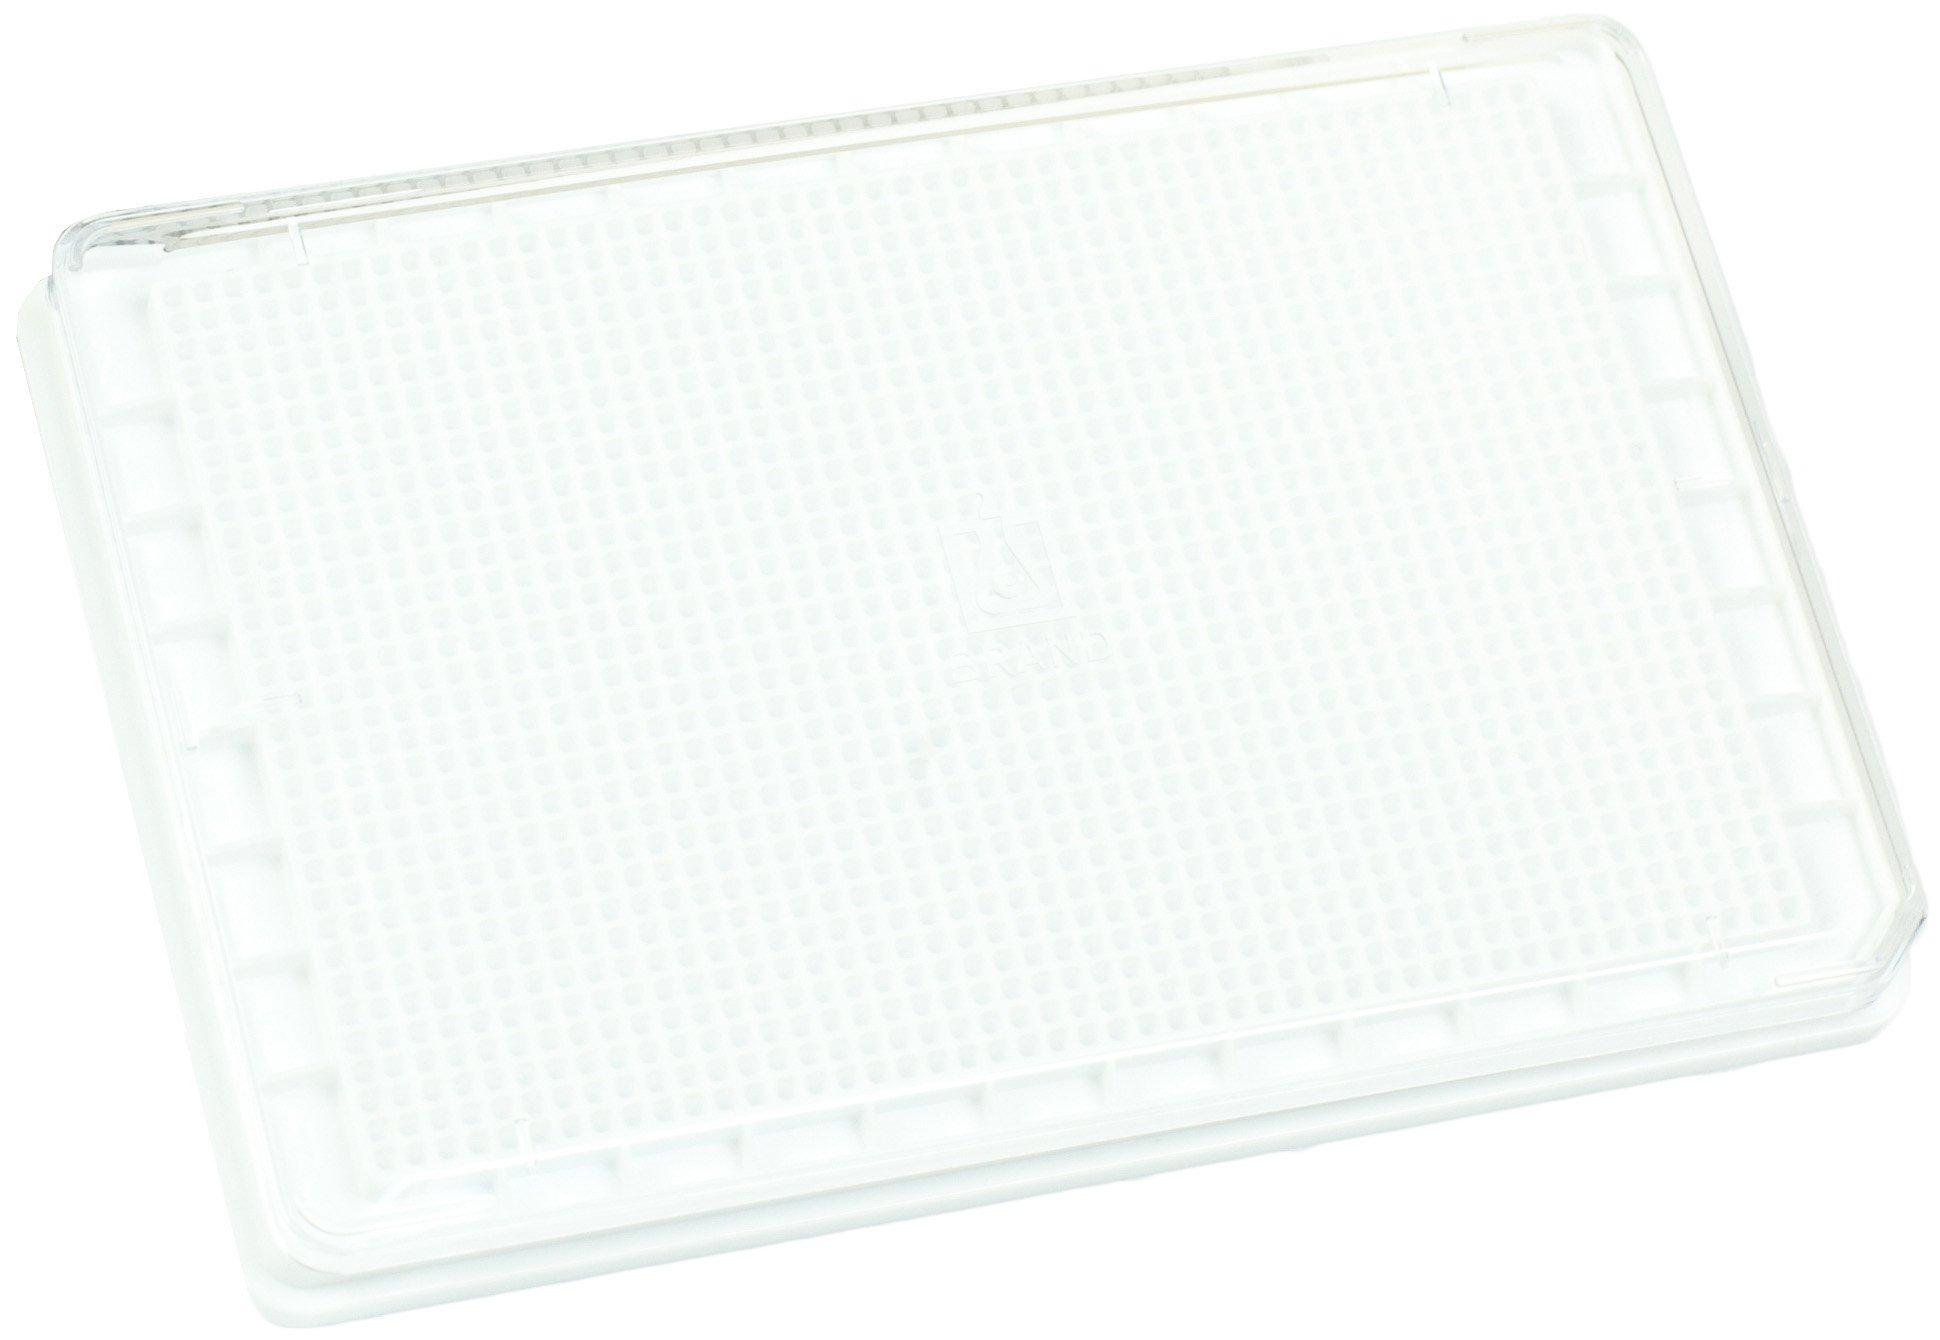 BRANDplates cellGrade Treated Sterile Surface 1536-Well Plate - White, F-Bottom